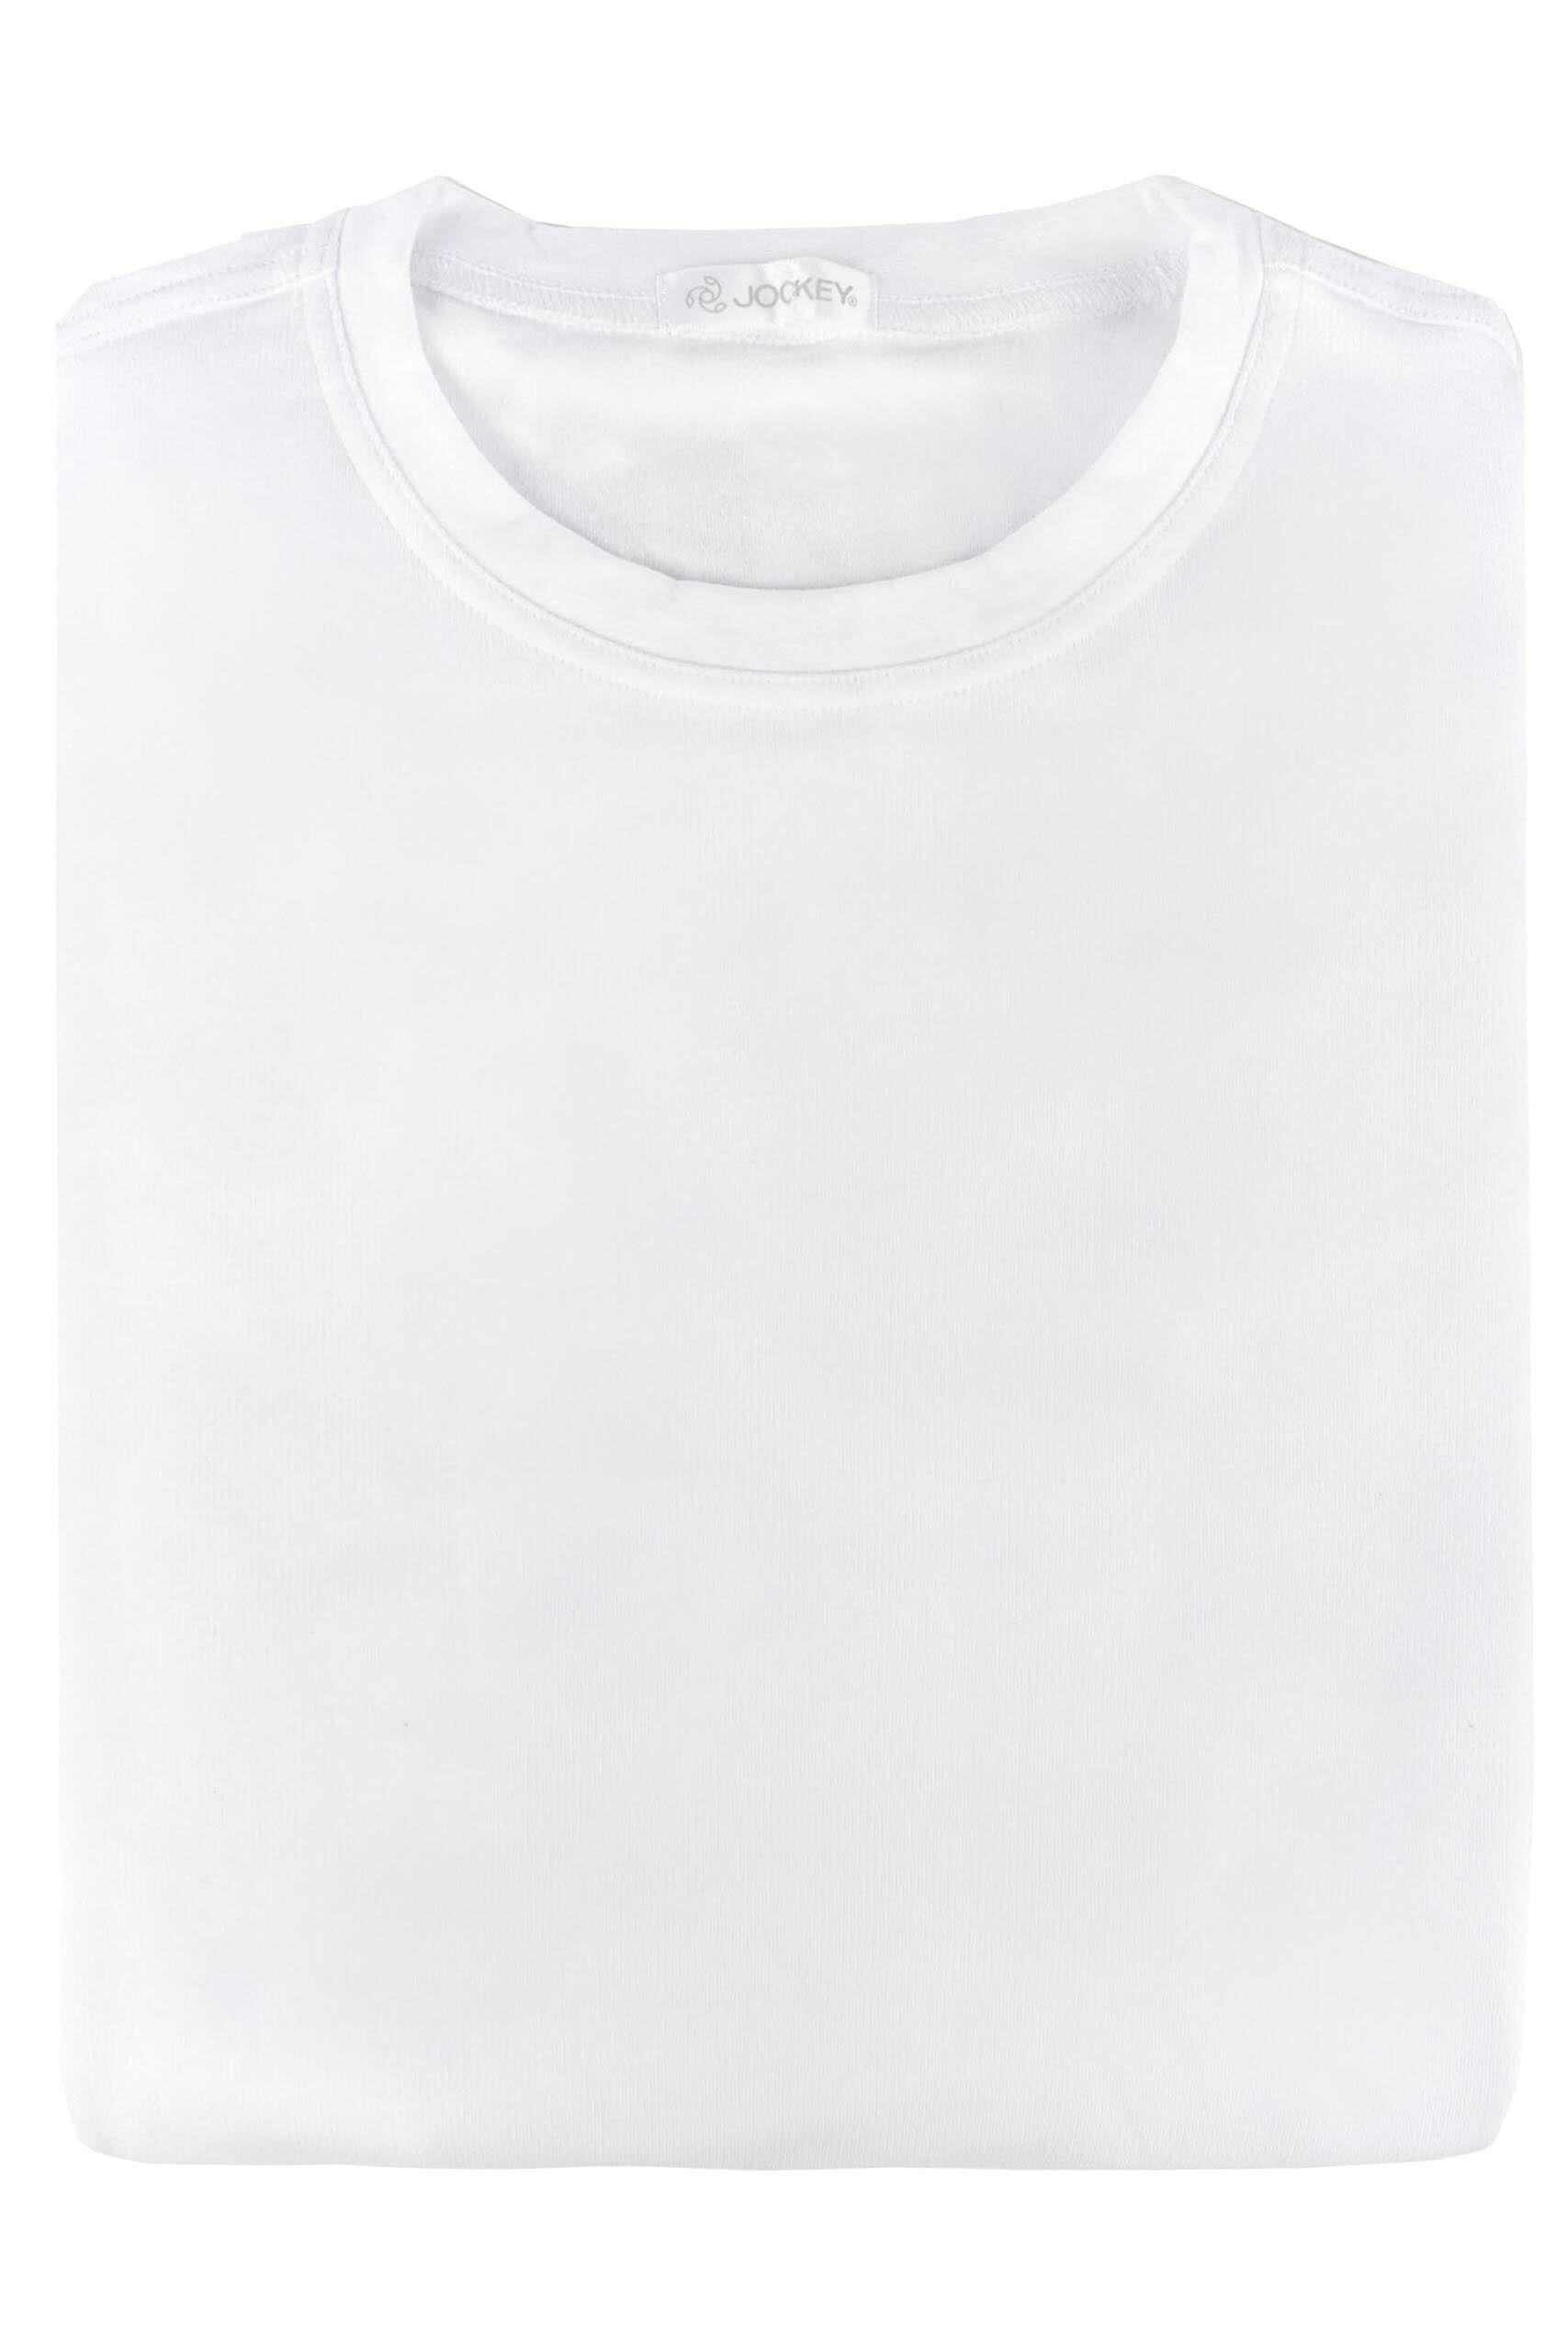 Image of 1 Pack White Thermal Crew Neck Long Sleeve T-Shirt Men's Large - Jockey